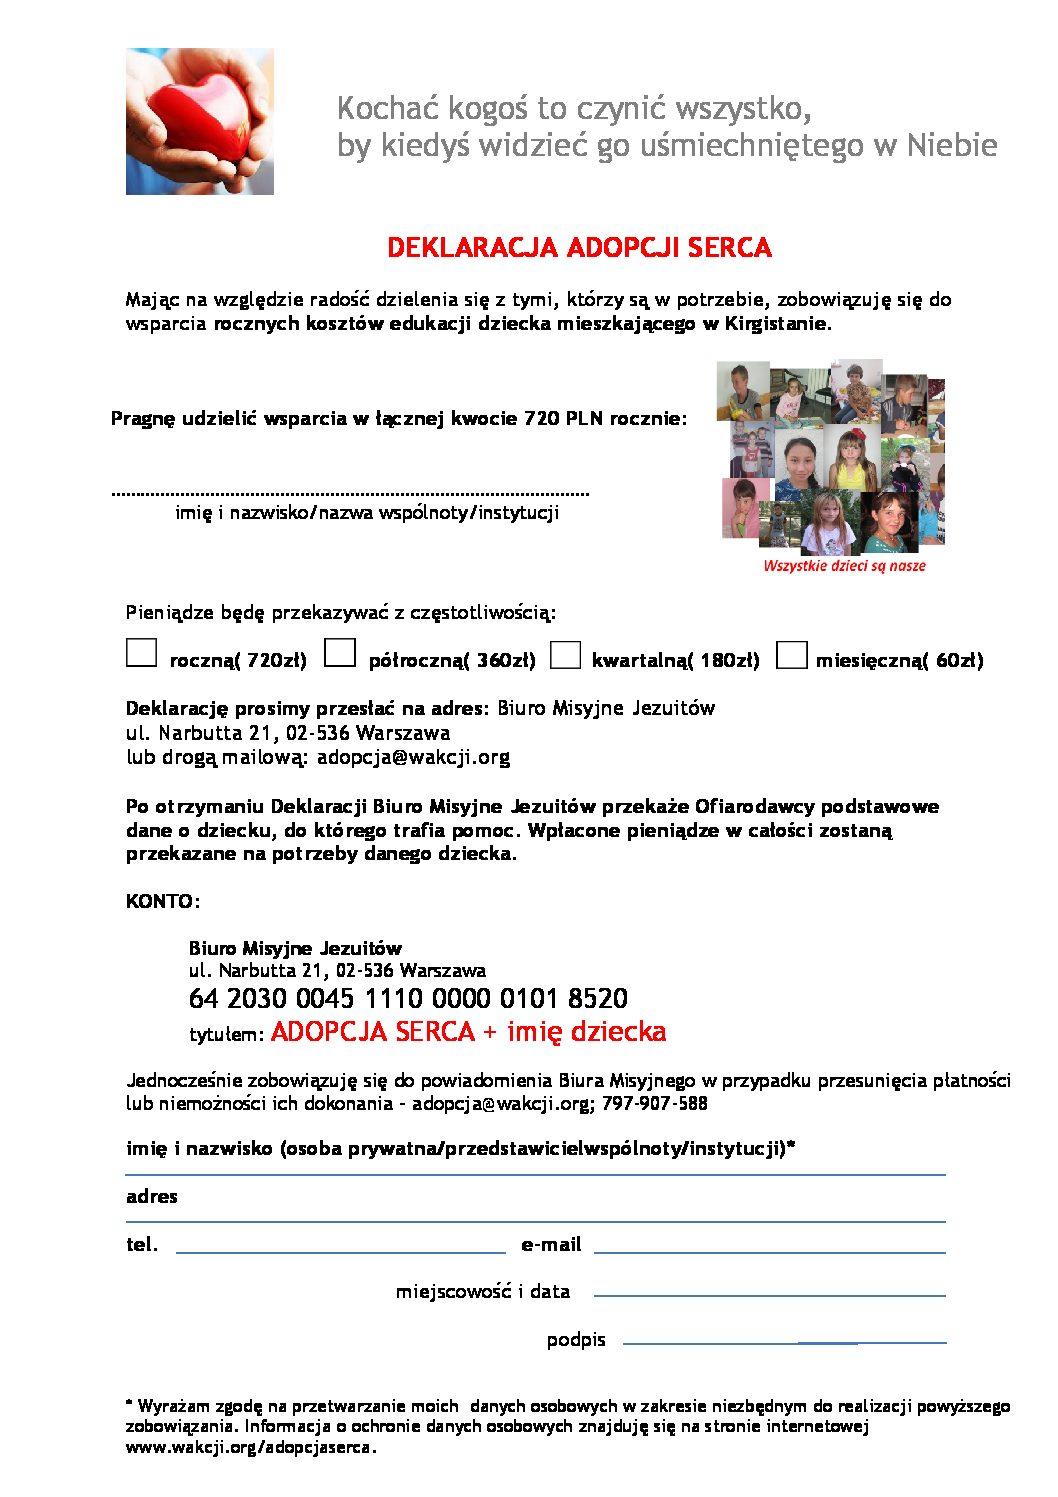 Deklaracja Adopcji Serca